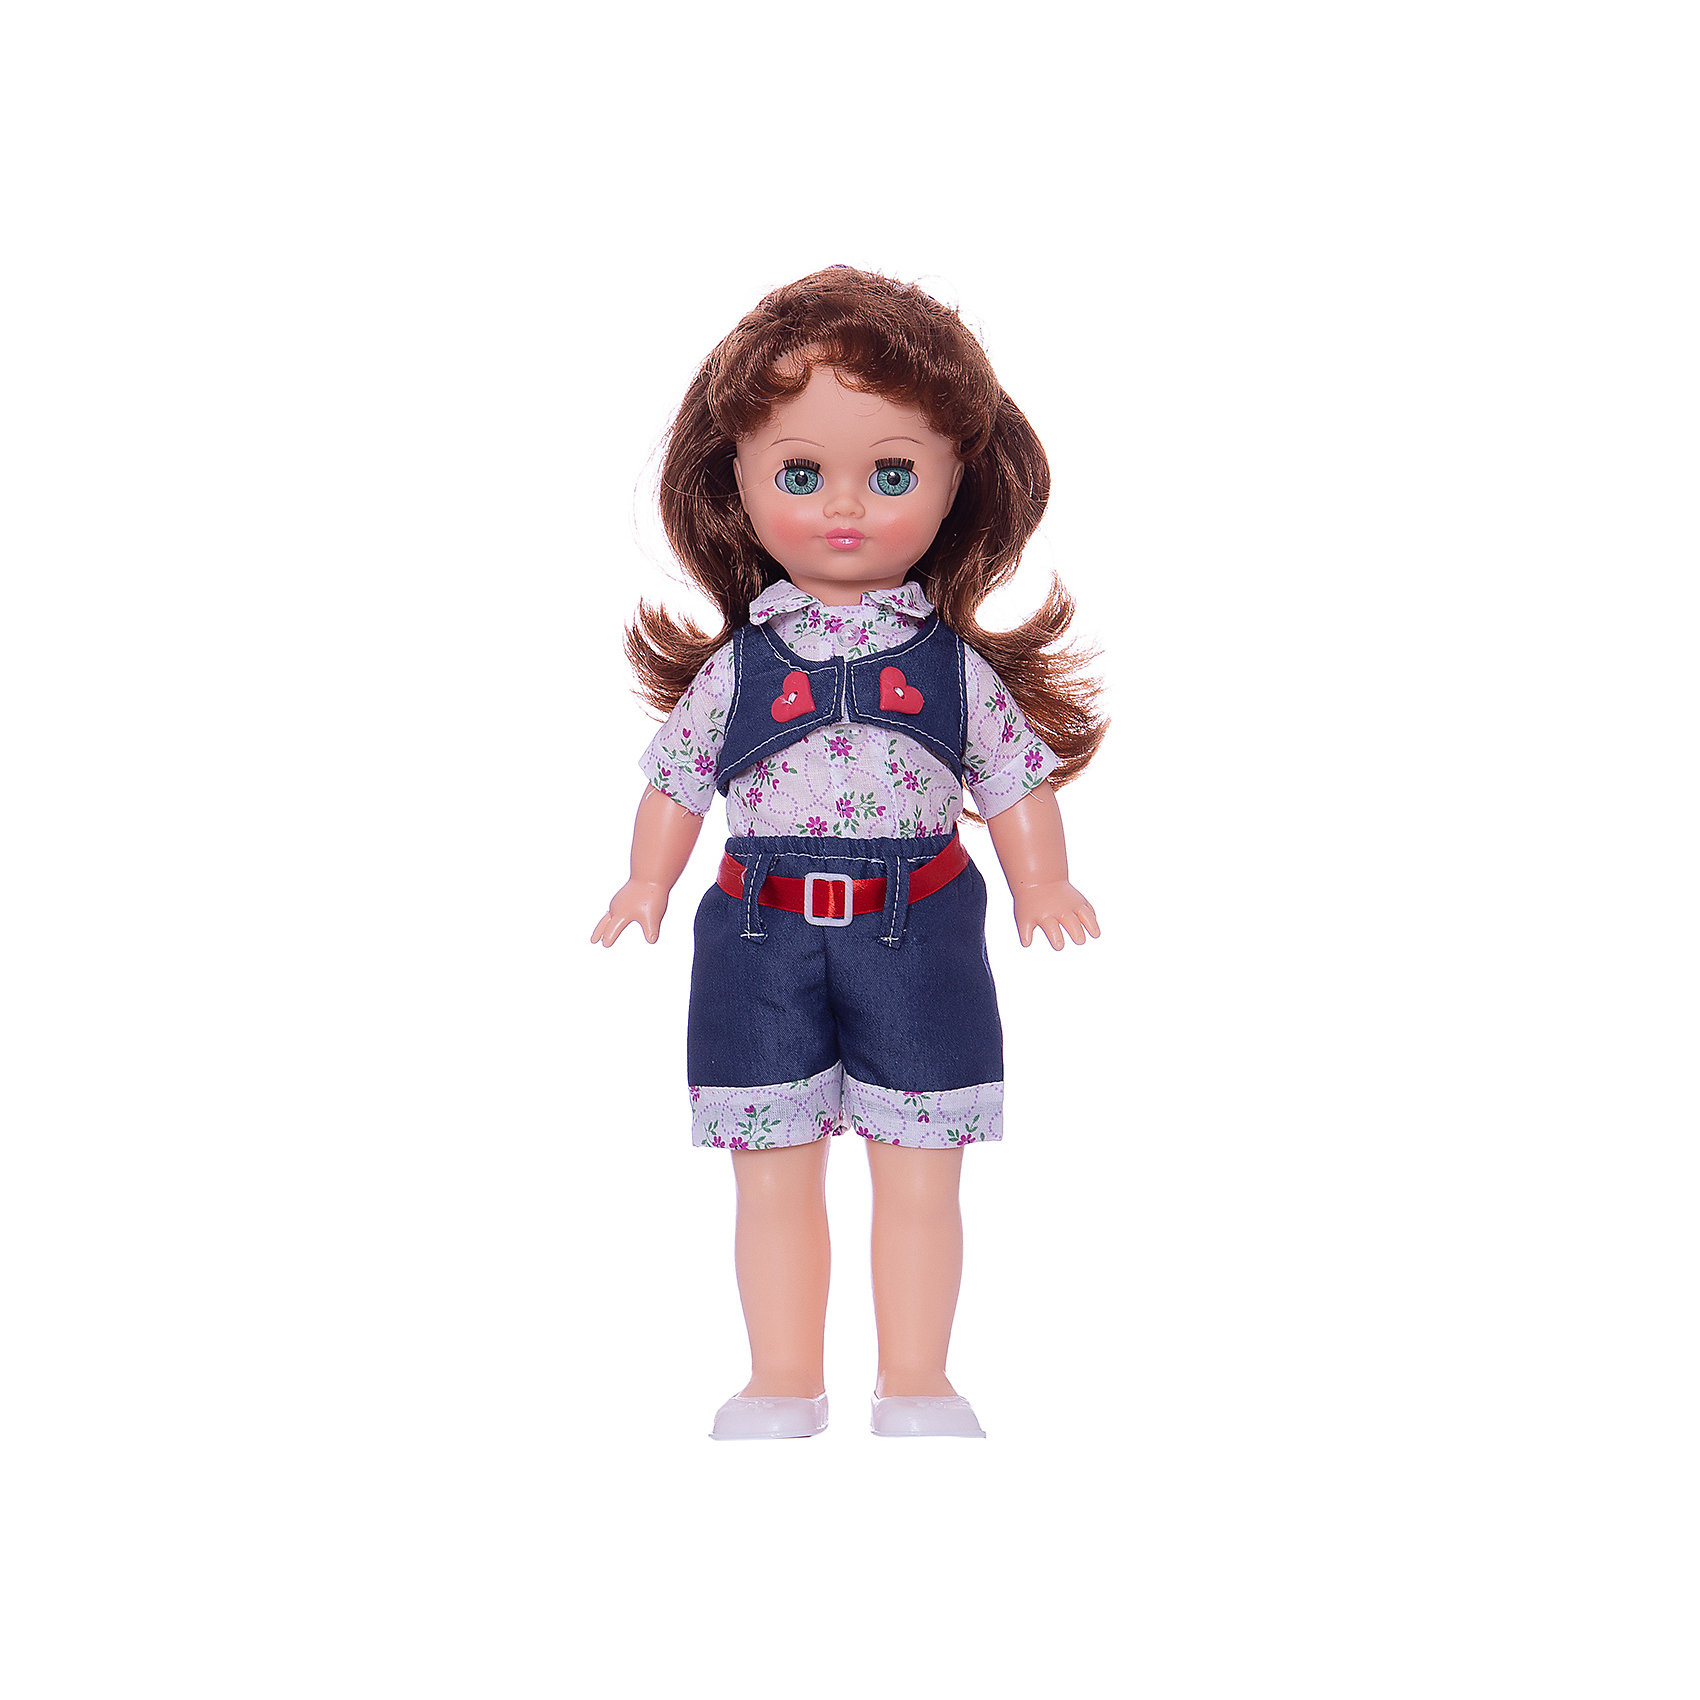 Кукла Маргарита 10, со звуком, 40 см., ВеснаКлассические куклы<br><br><br>Ширина мм: 420<br>Глубина мм: 170<br>Высота мм: 100<br>Вес г: 400<br>Возраст от месяцев: 36<br>Возраст до месяцев: 144<br>Пол: Женский<br>Возраст: Детский<br>SKU: 4896501